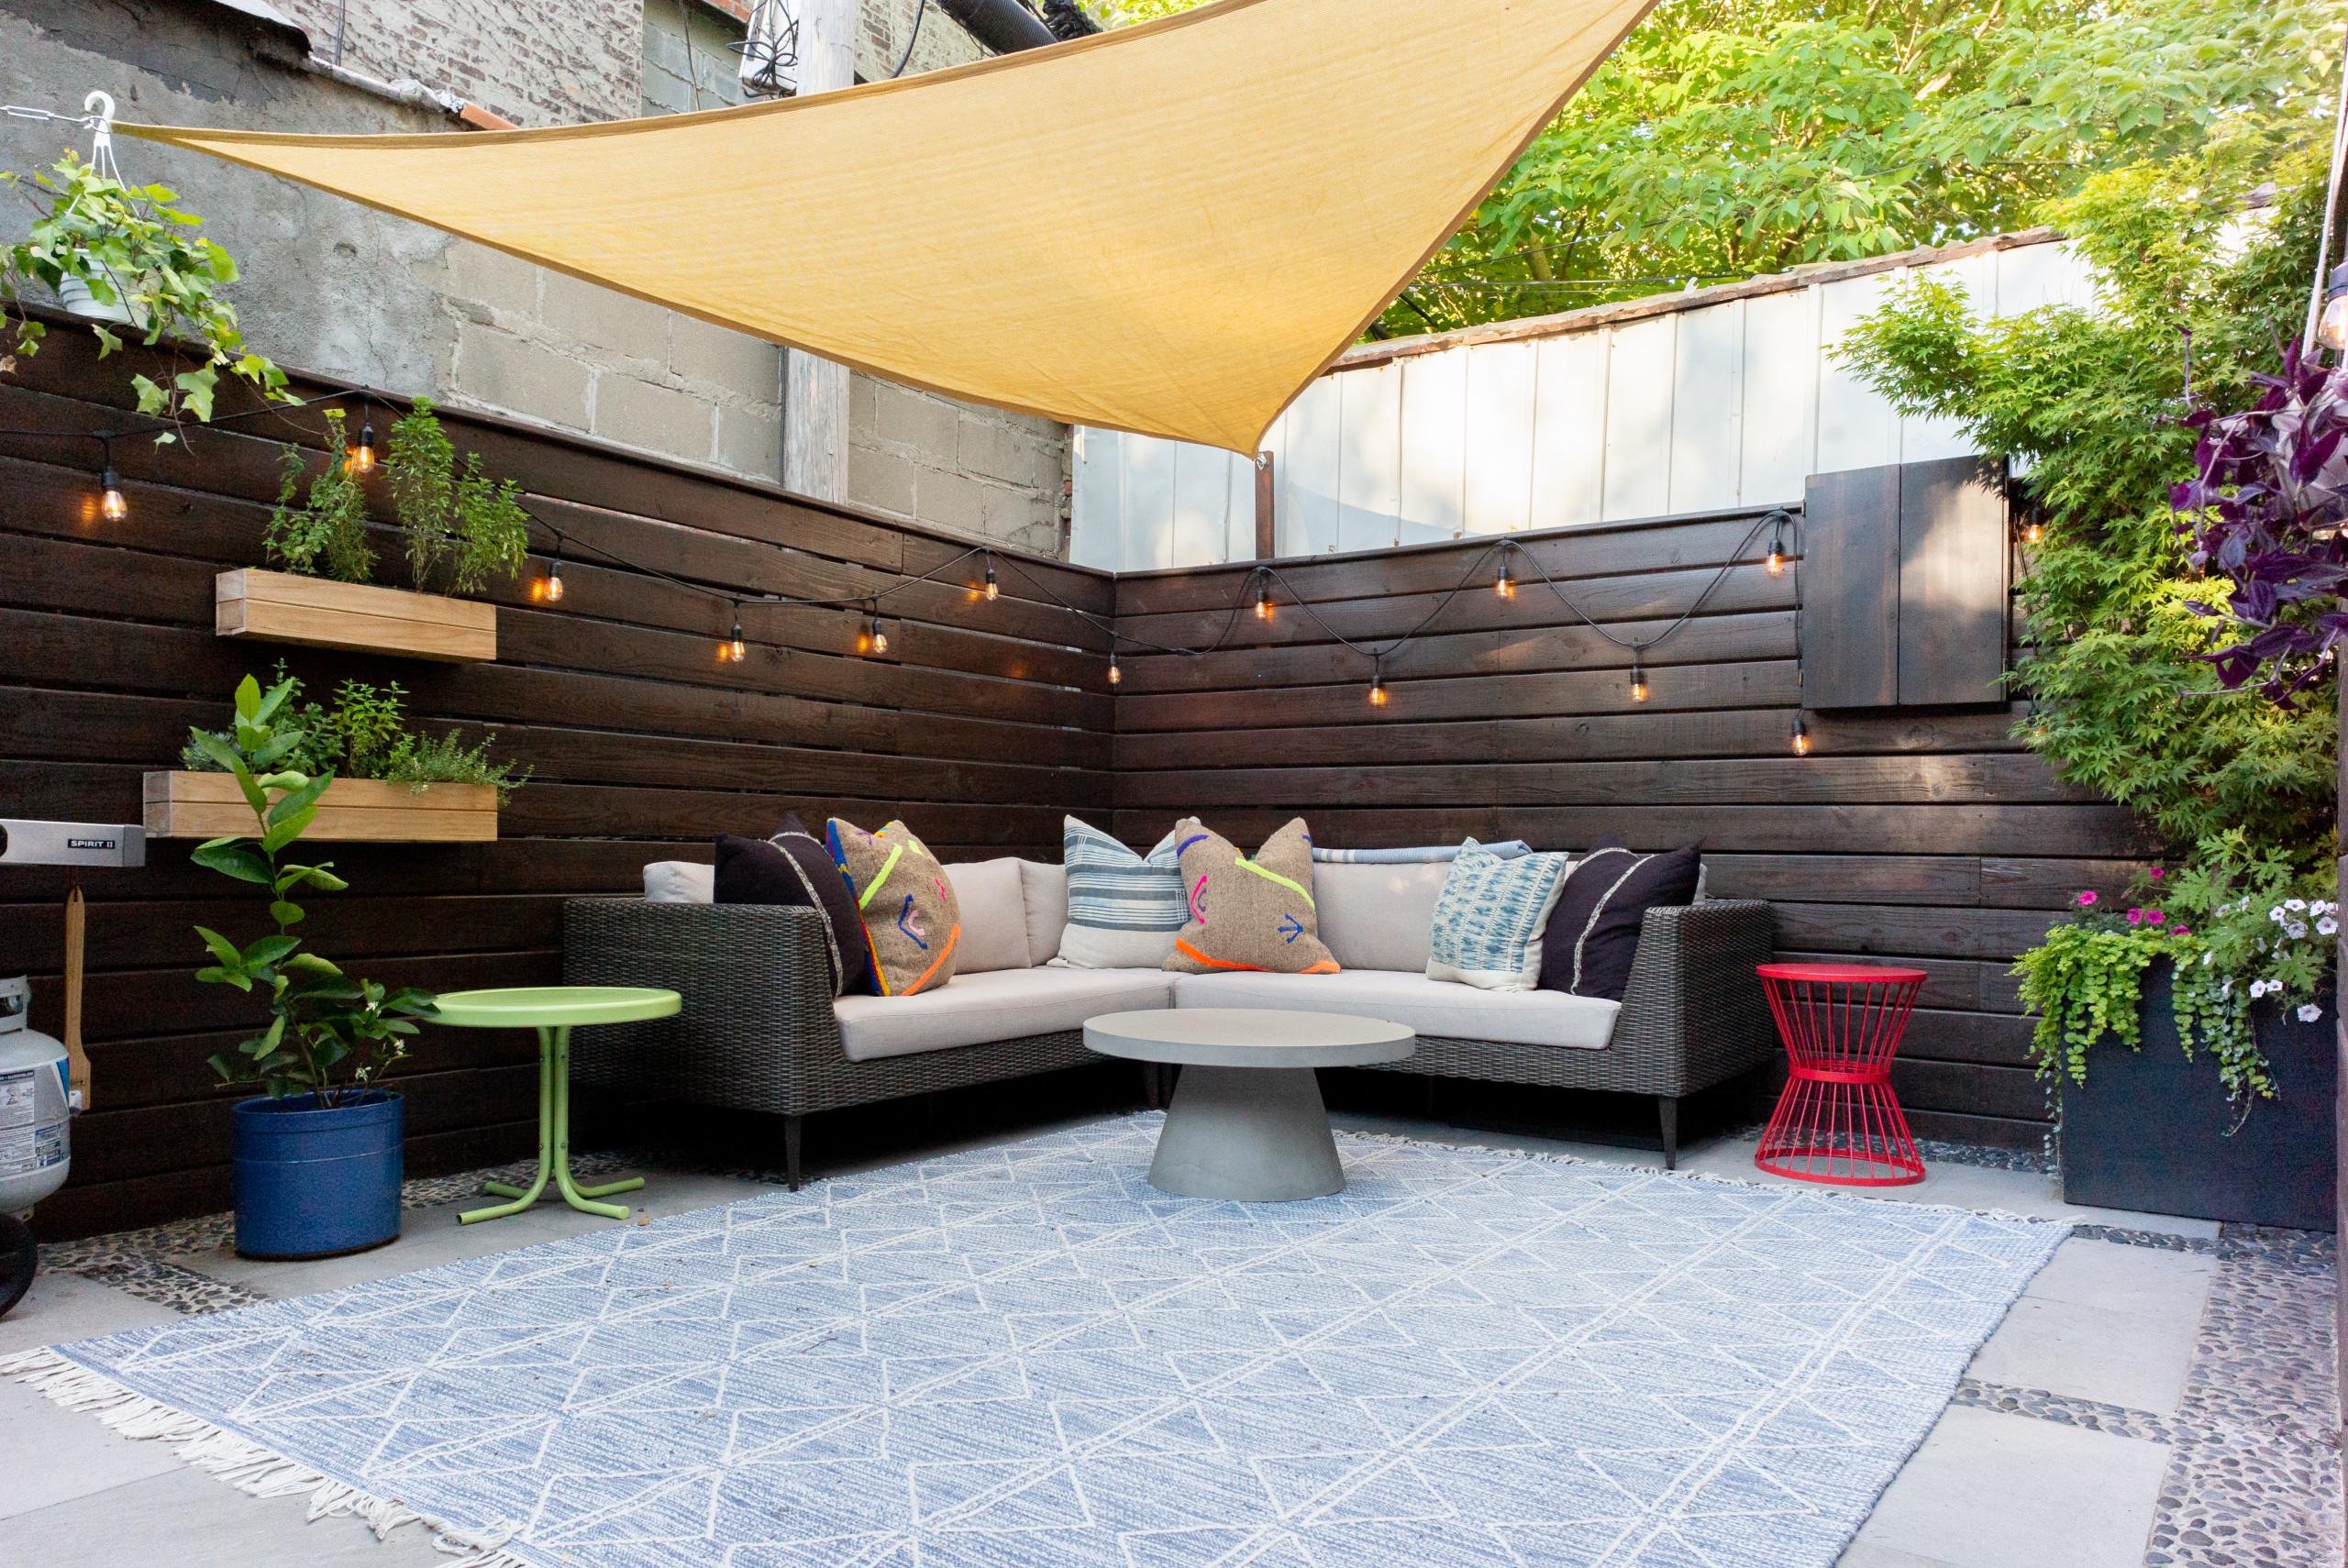 75 Beautiful Concrete Patio Pictures Ideas September 2020 Houzz